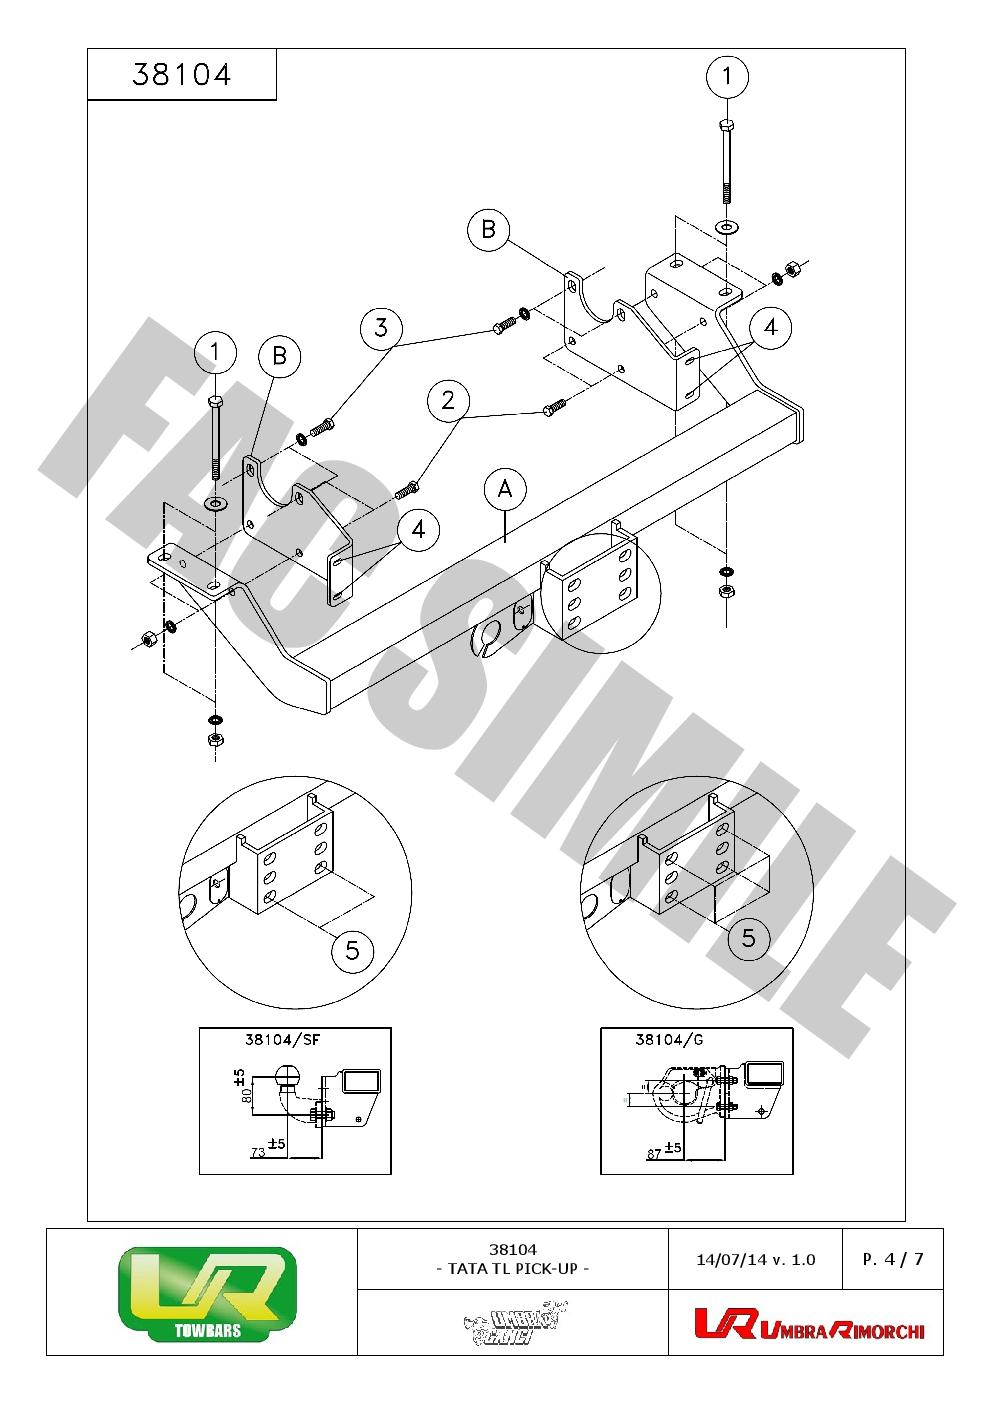 Fixed Flange Towbar 13 pin kit C2 electrics New Car Tow